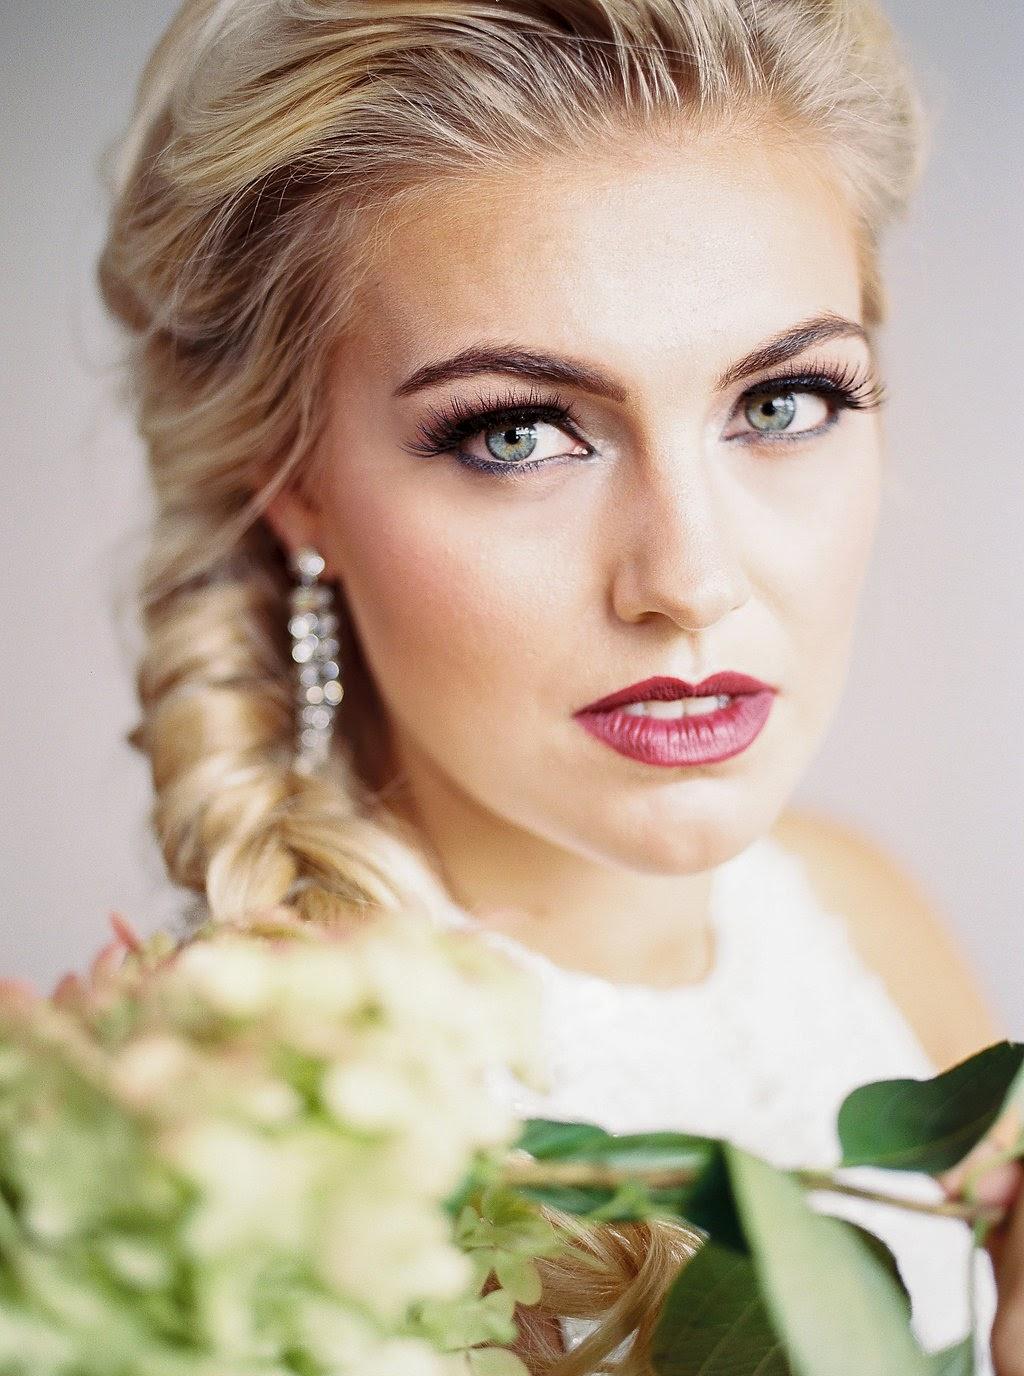 Alexandra-Elise-Photography-Ali-Reed-Film-Wedding-Photographer-179.jpg